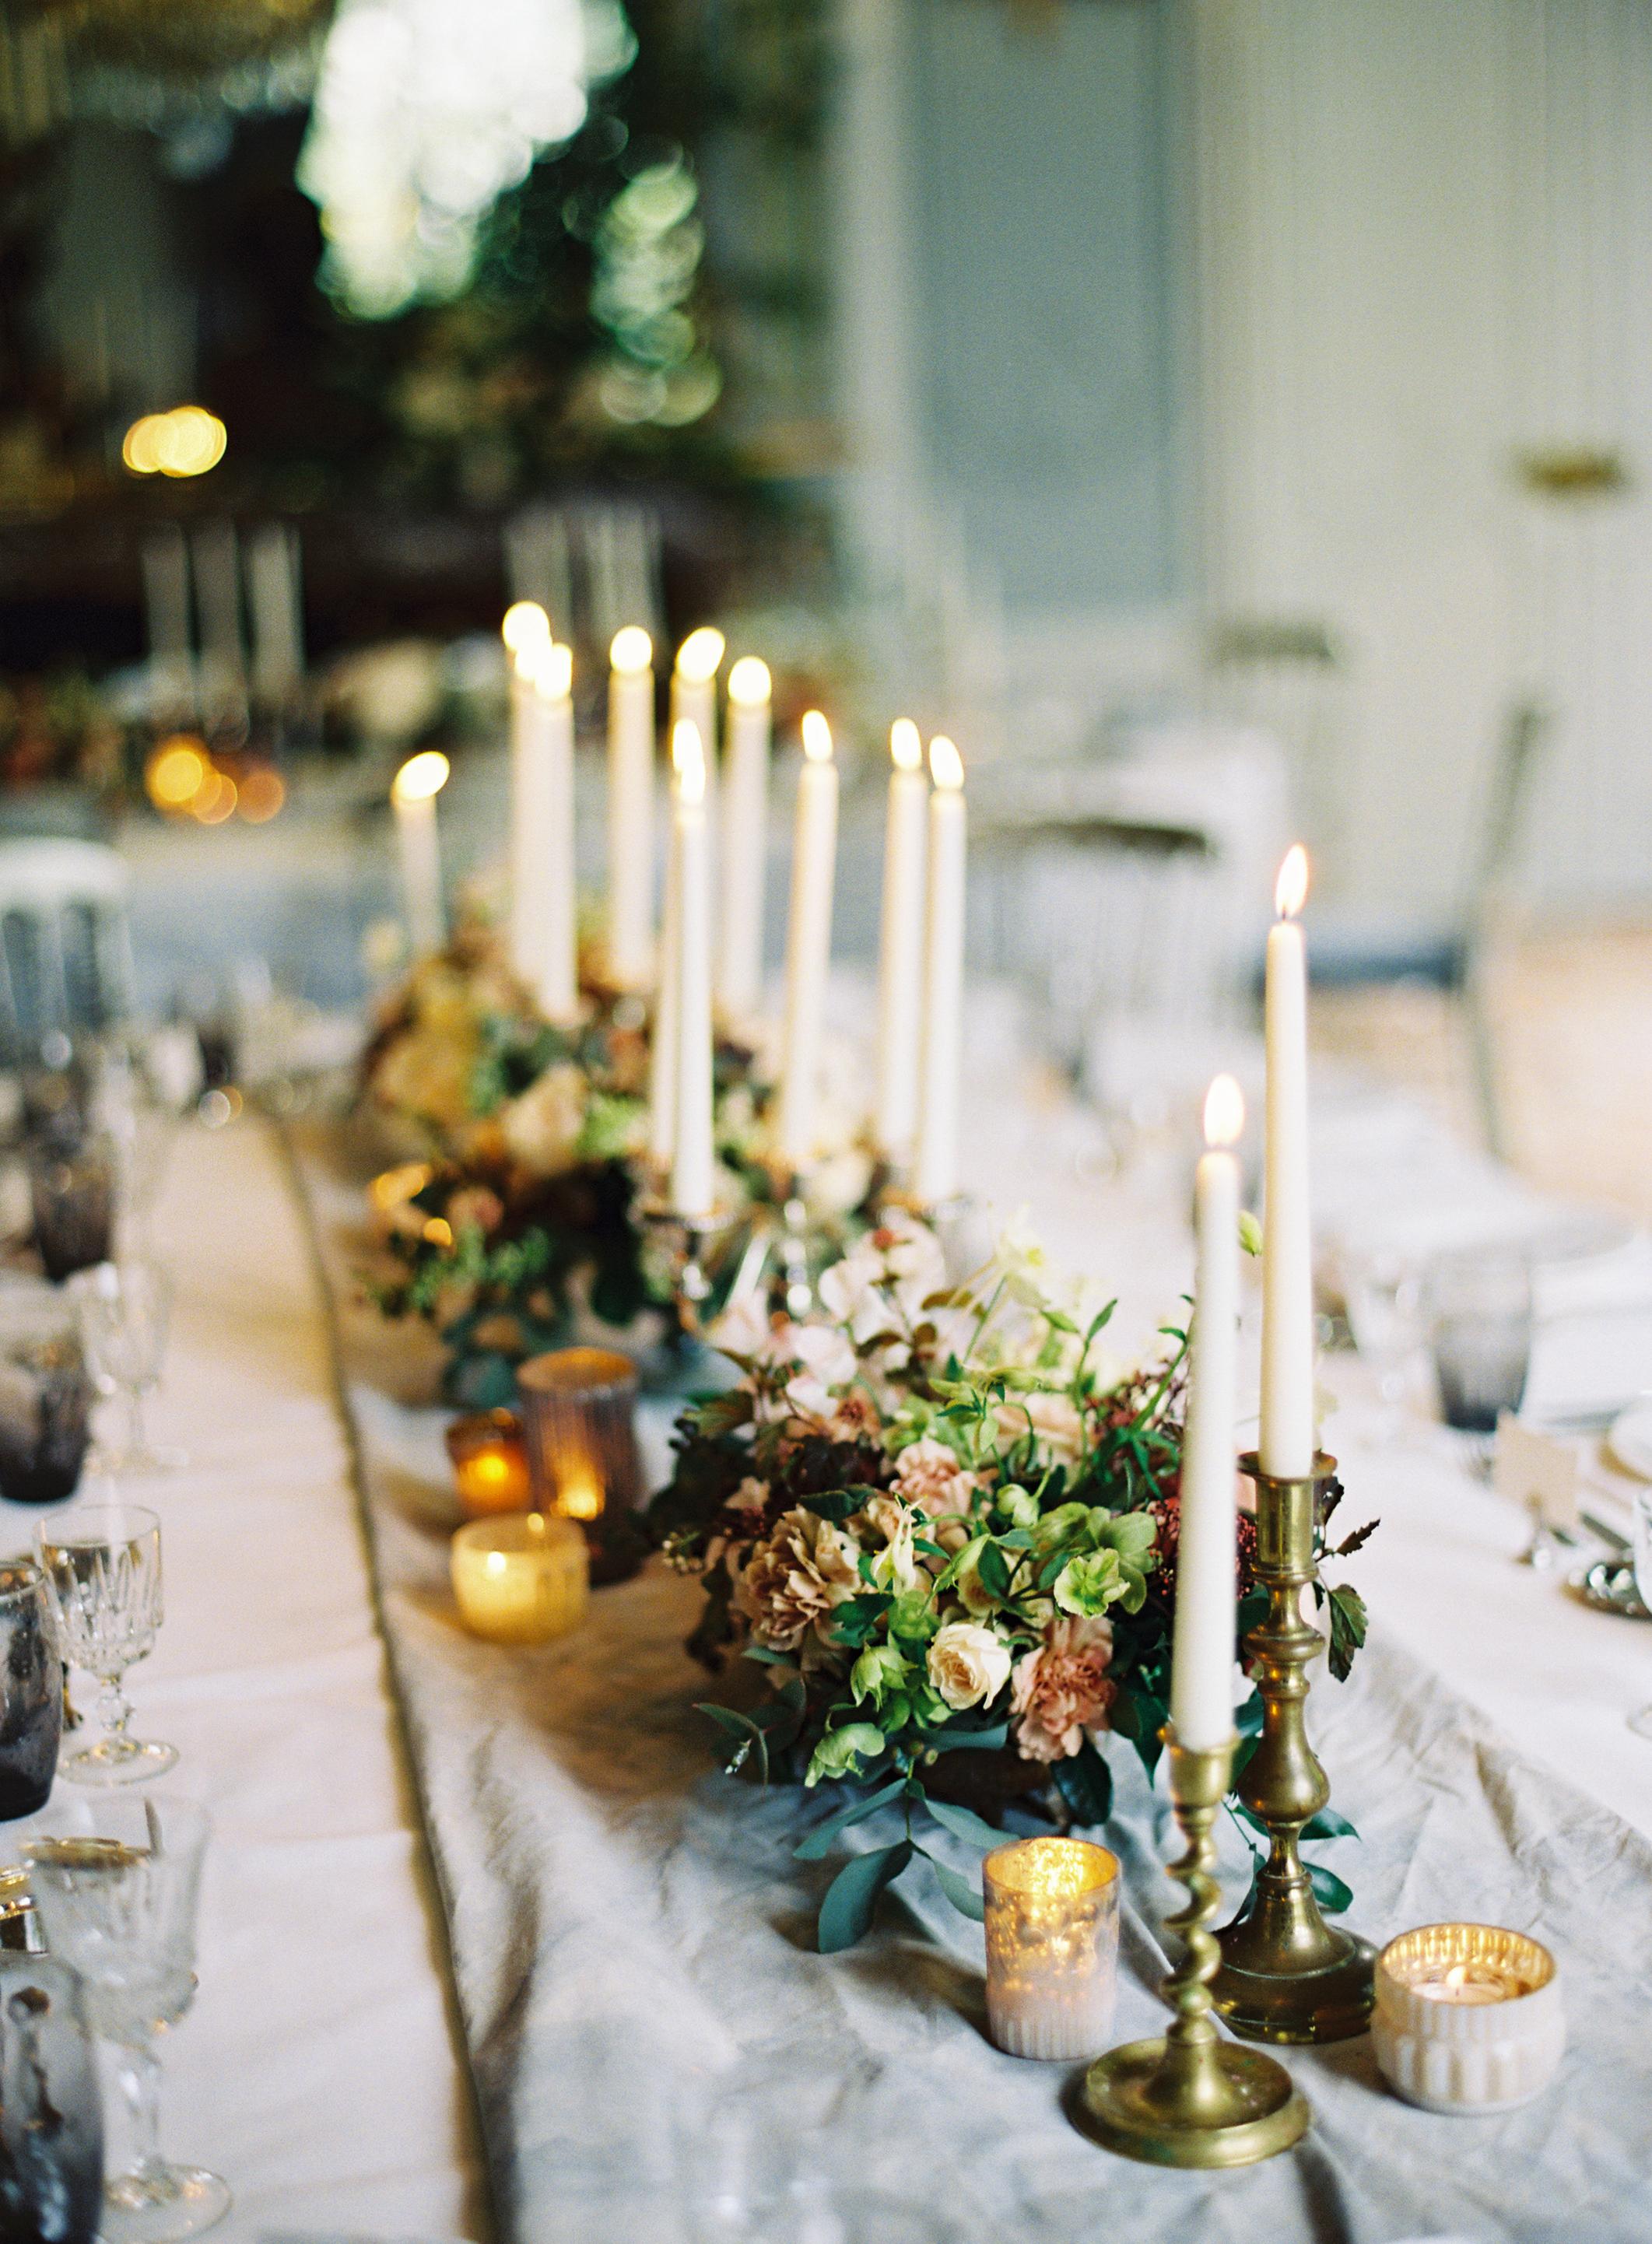 Paris-France-Film-Wedding-Carrie King Photographer-4.jpg